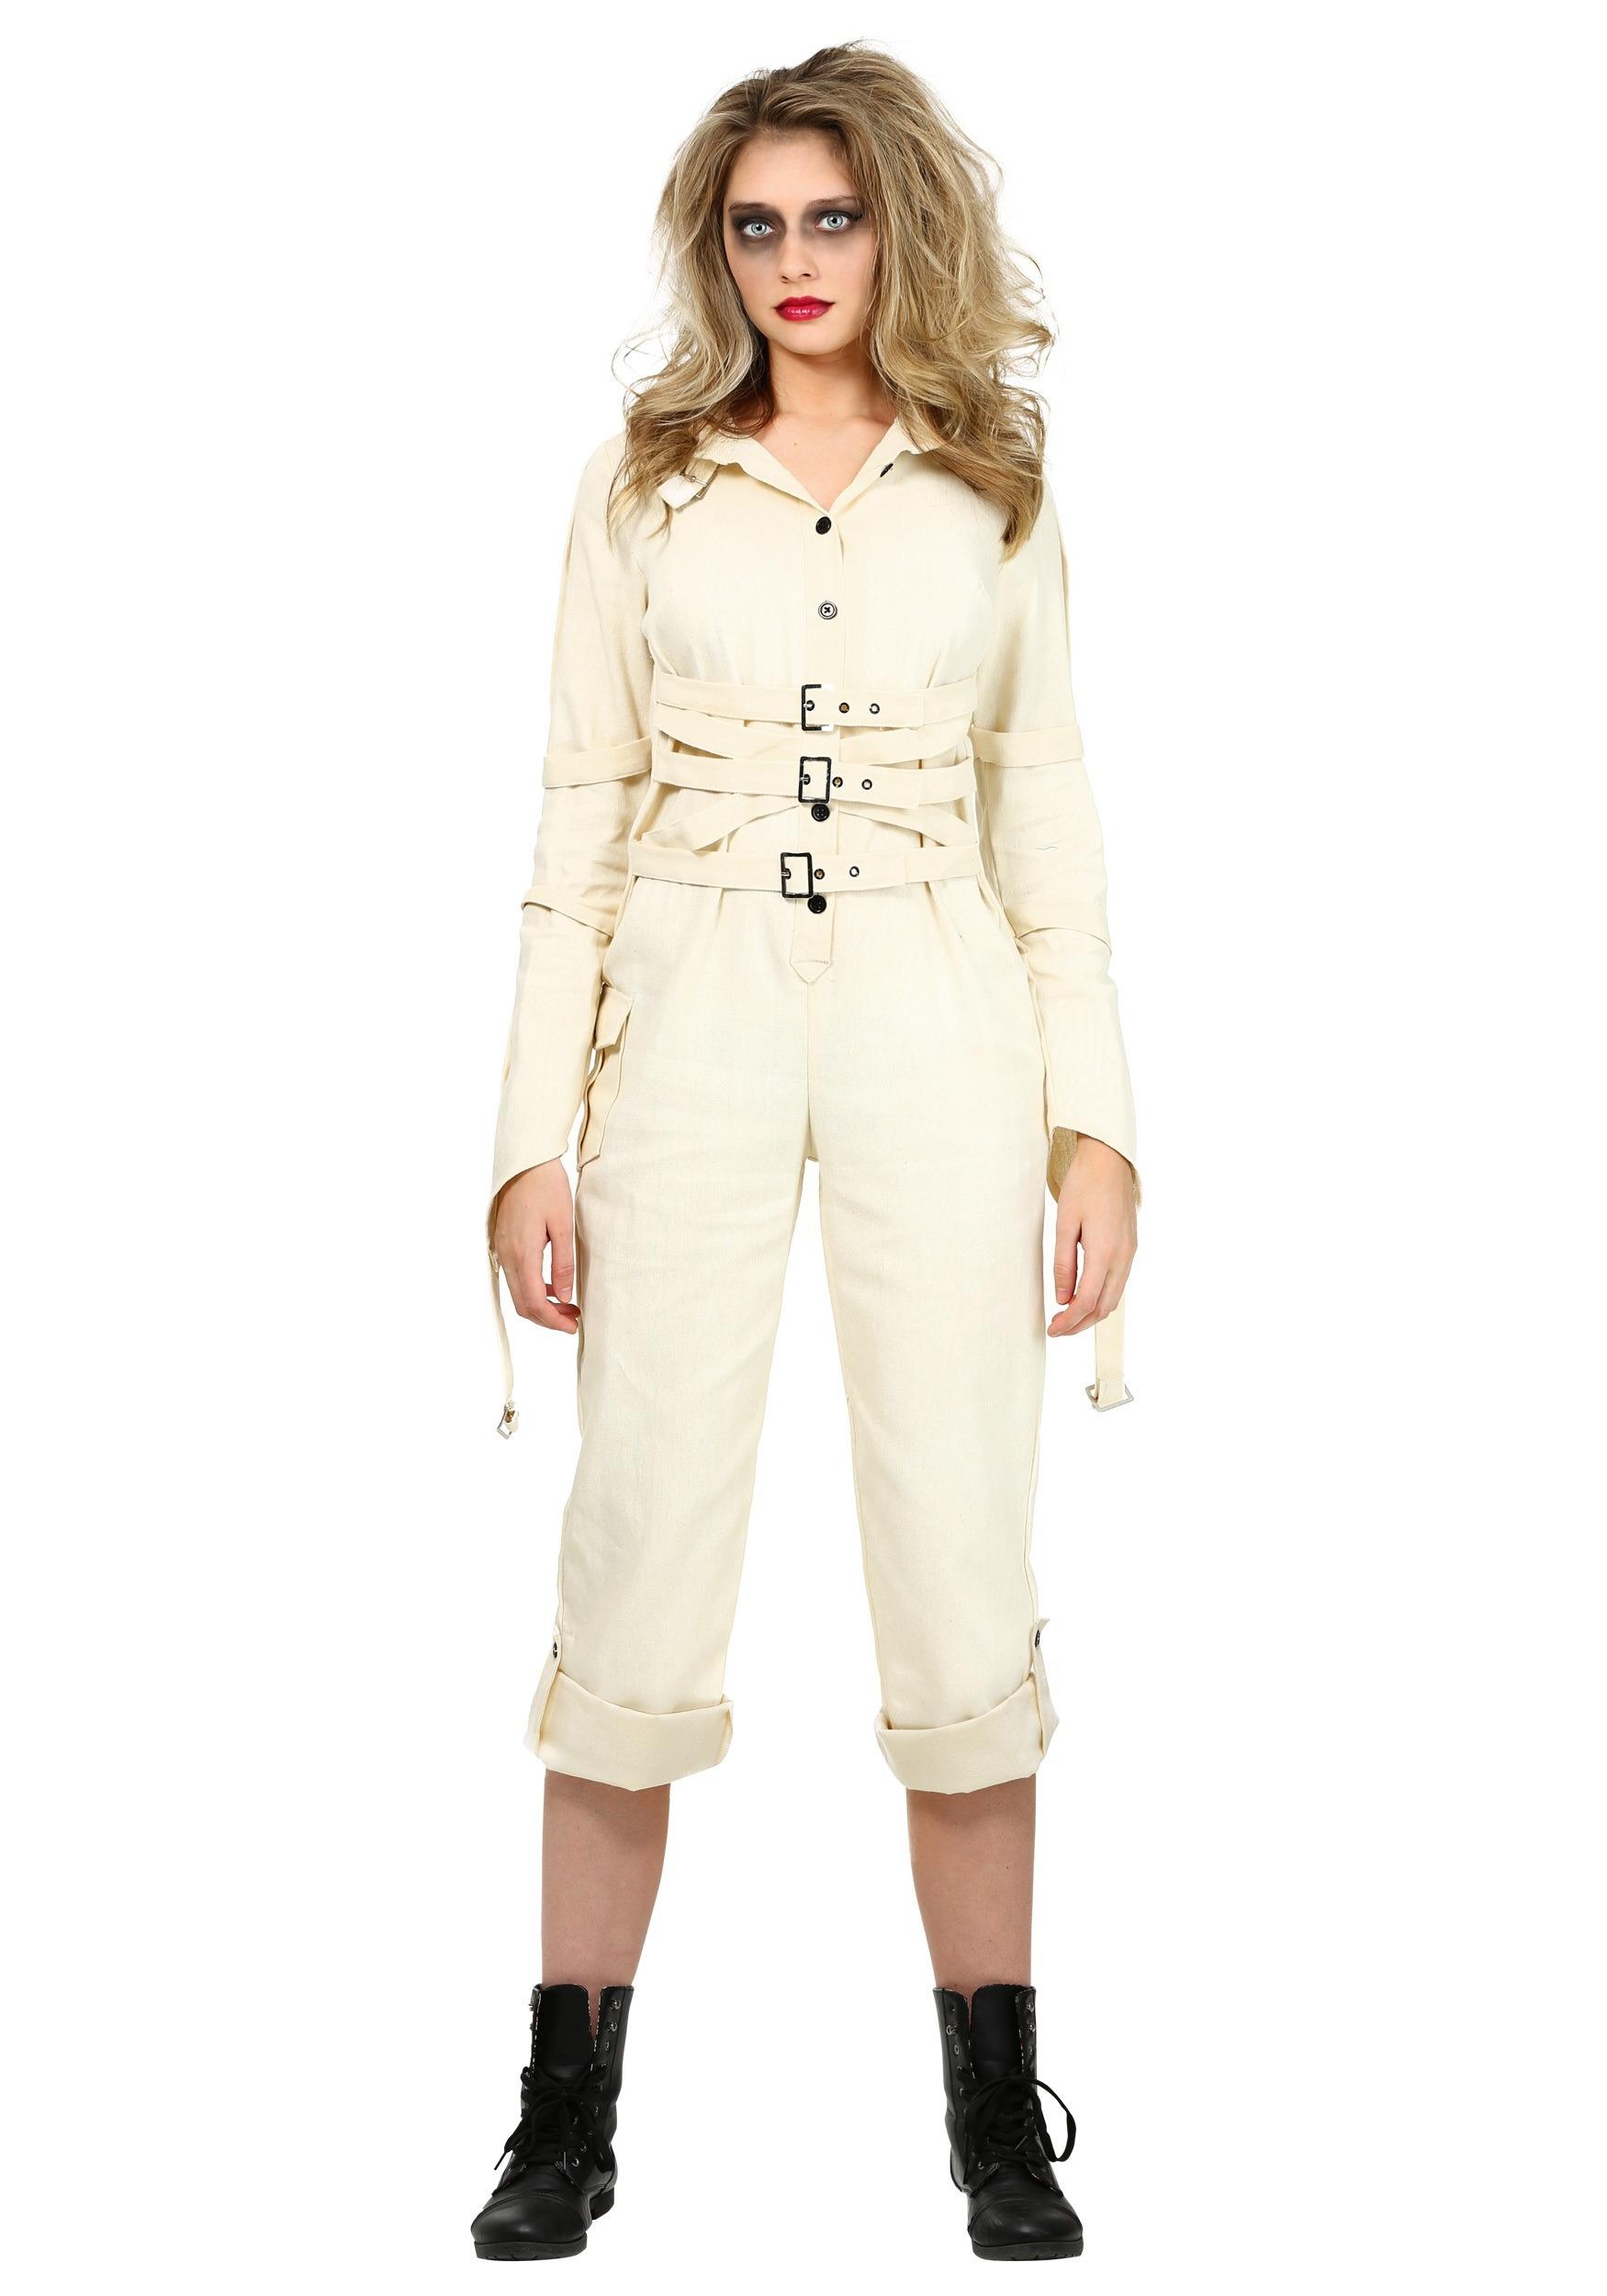 Plus Size Women's Insane Asylum Costume 1X 2X